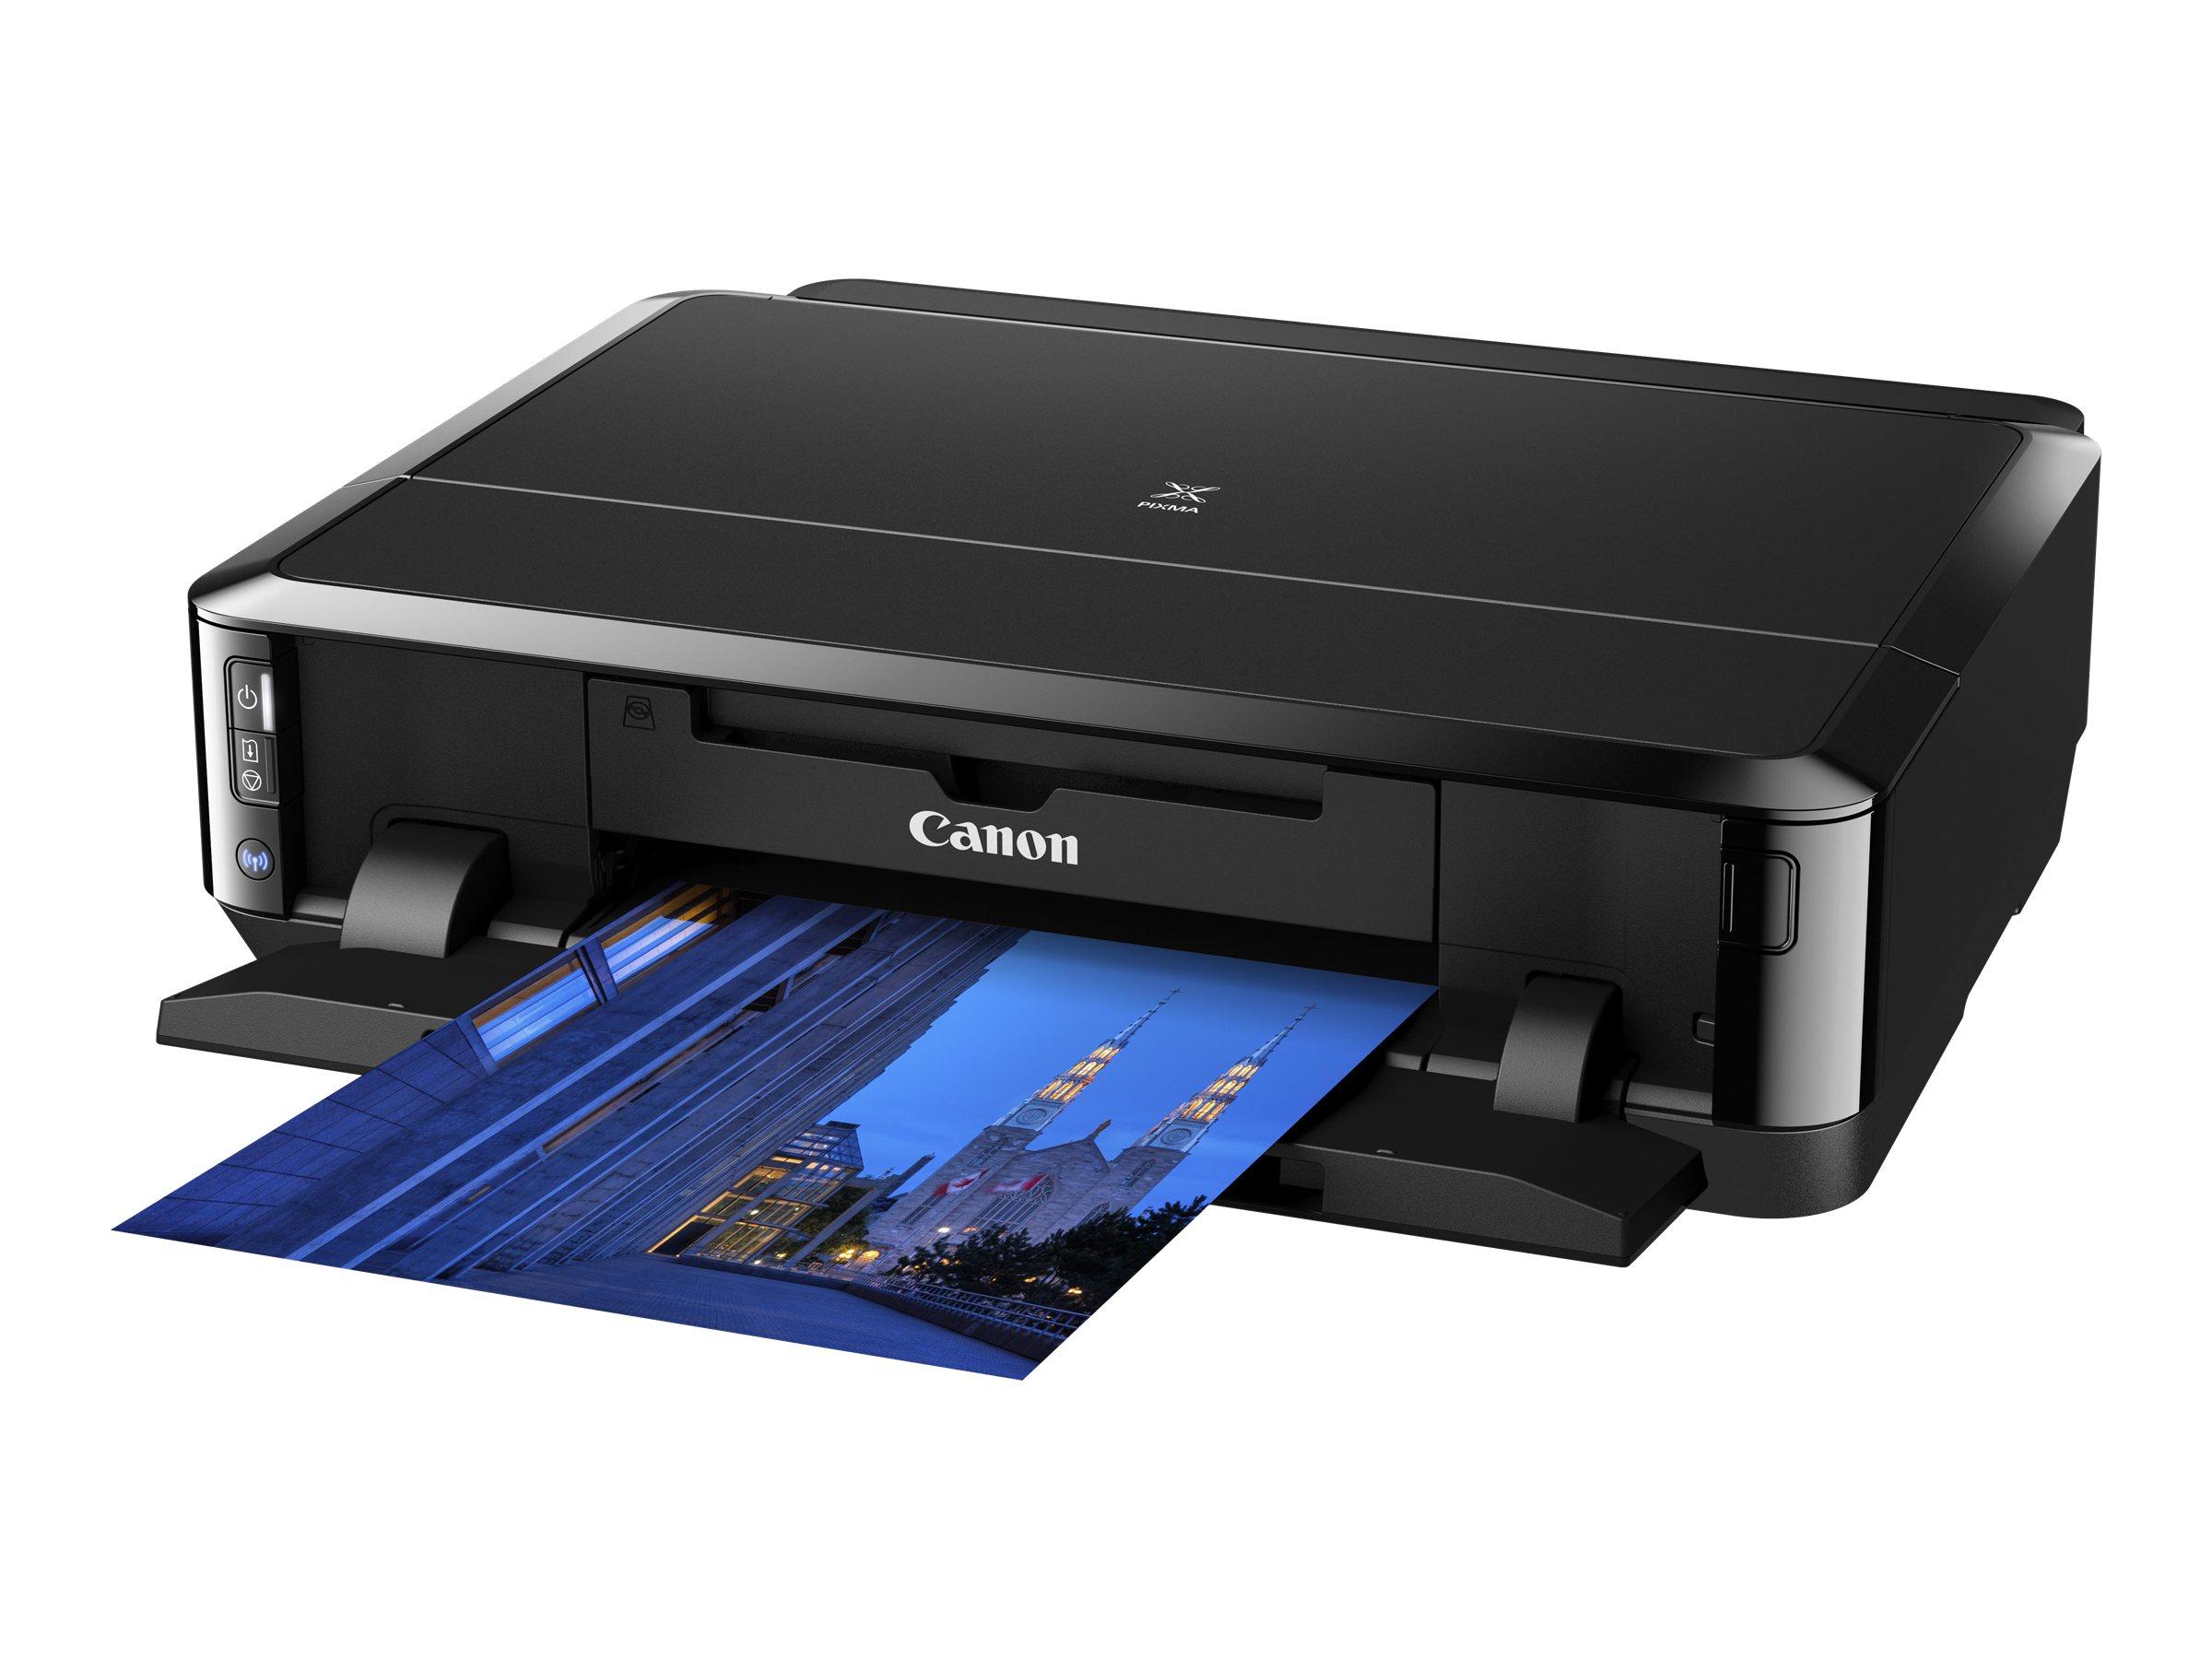 Canon PIXMA iP7250 - Drucker - Farbe - Duplex - Tintenstrahl - A4/Legal